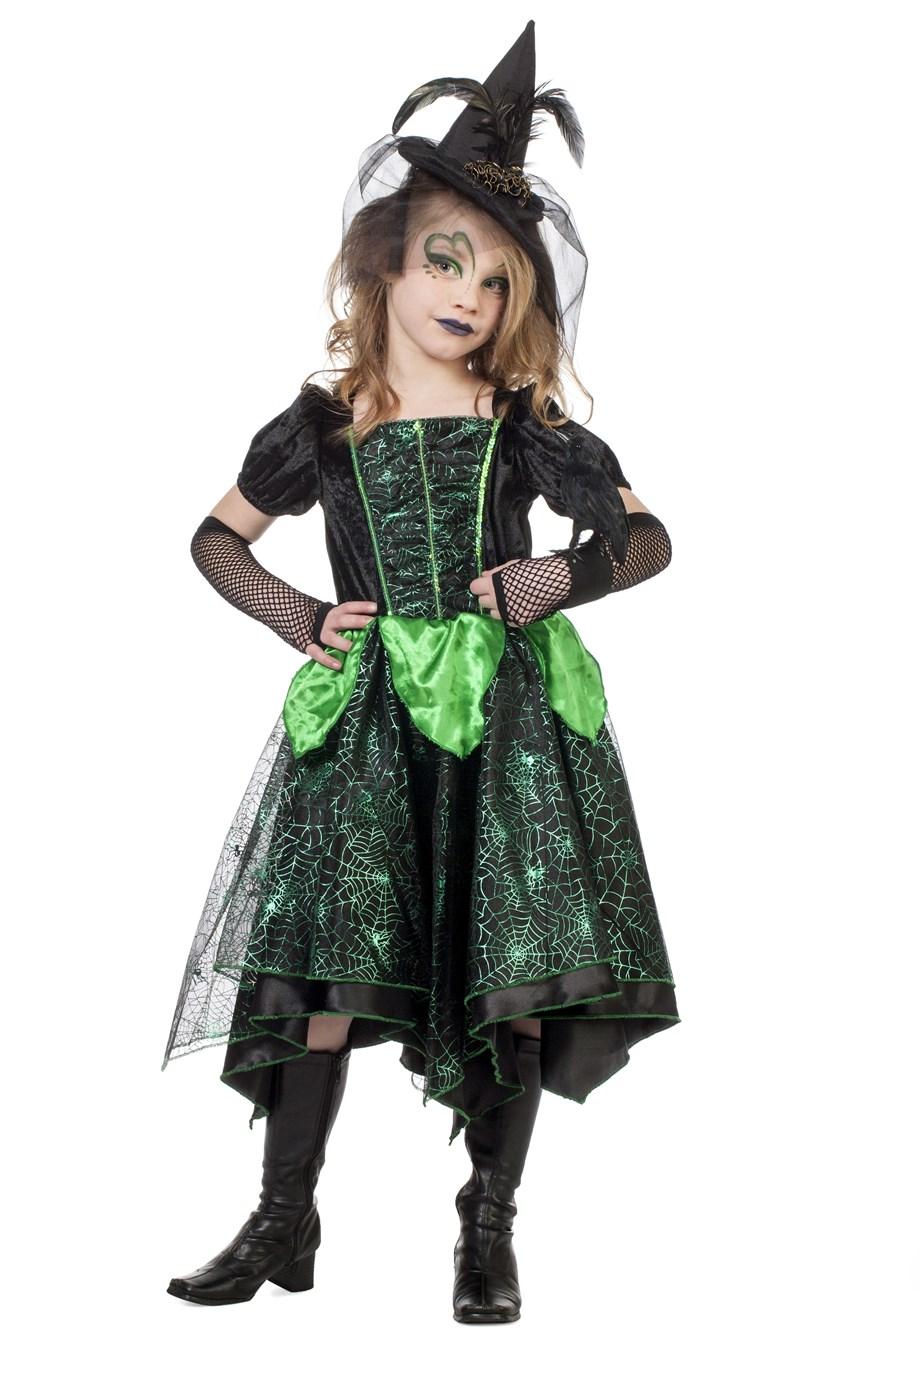 Grune Hexe Hexenkostum Madchen Halloween 104 Cm Glamour Wilbers